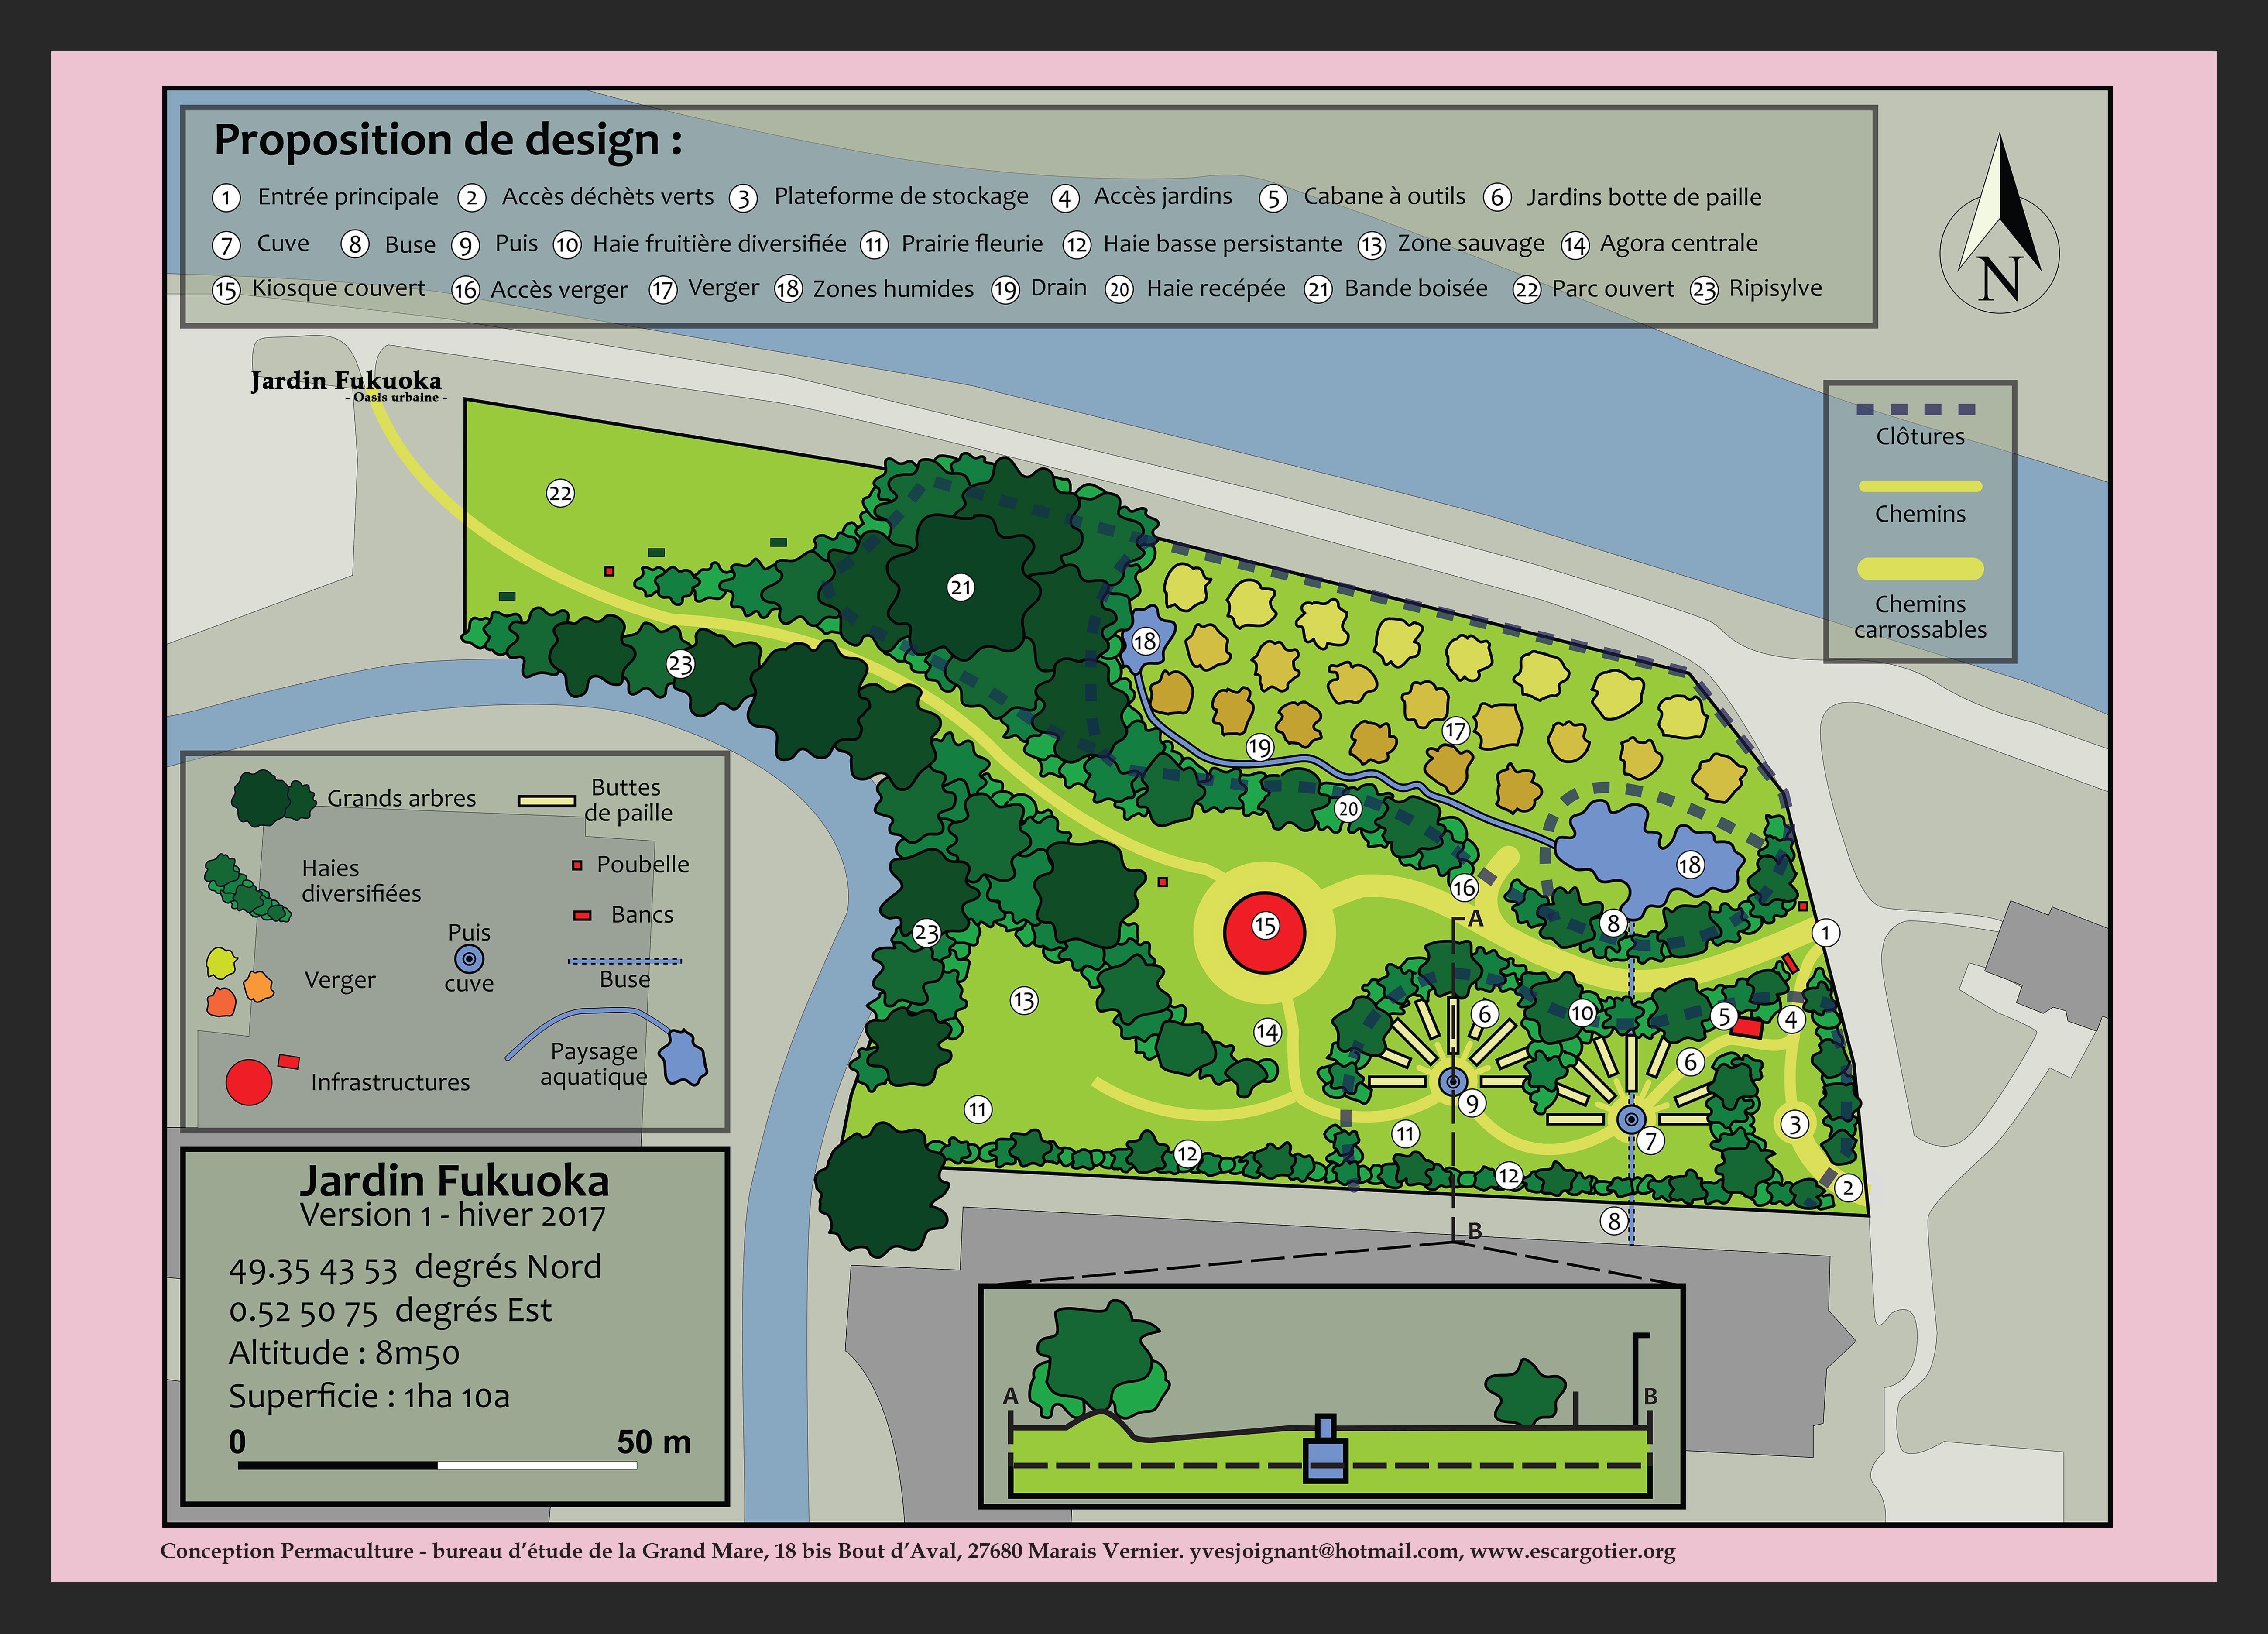 P6_Design_Jpeg